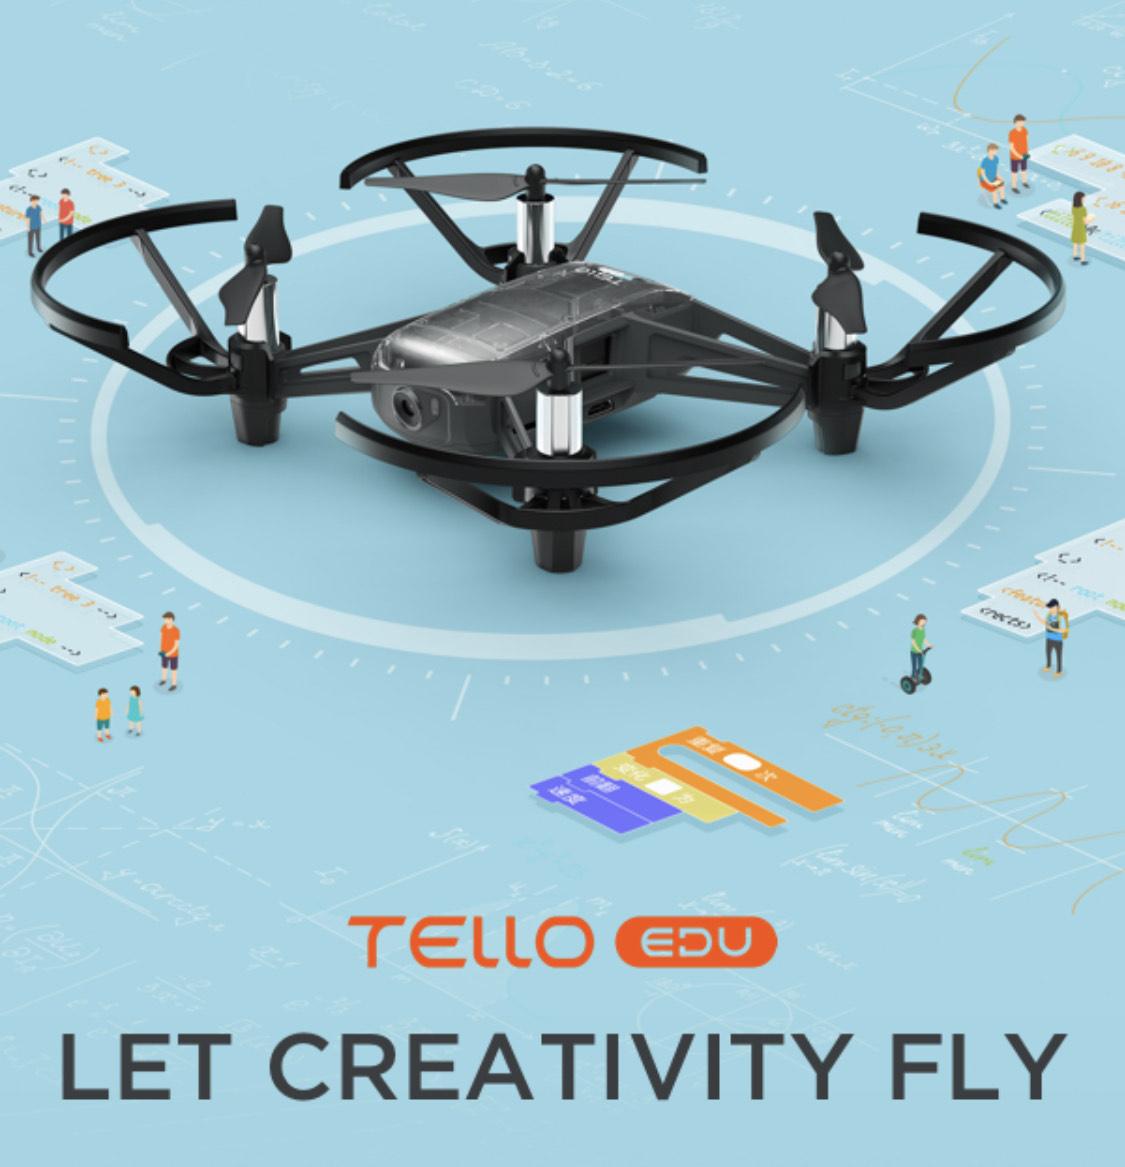 Ryze DJI Tello drone - EDU edition £118.48 delivered @ Ebuyer